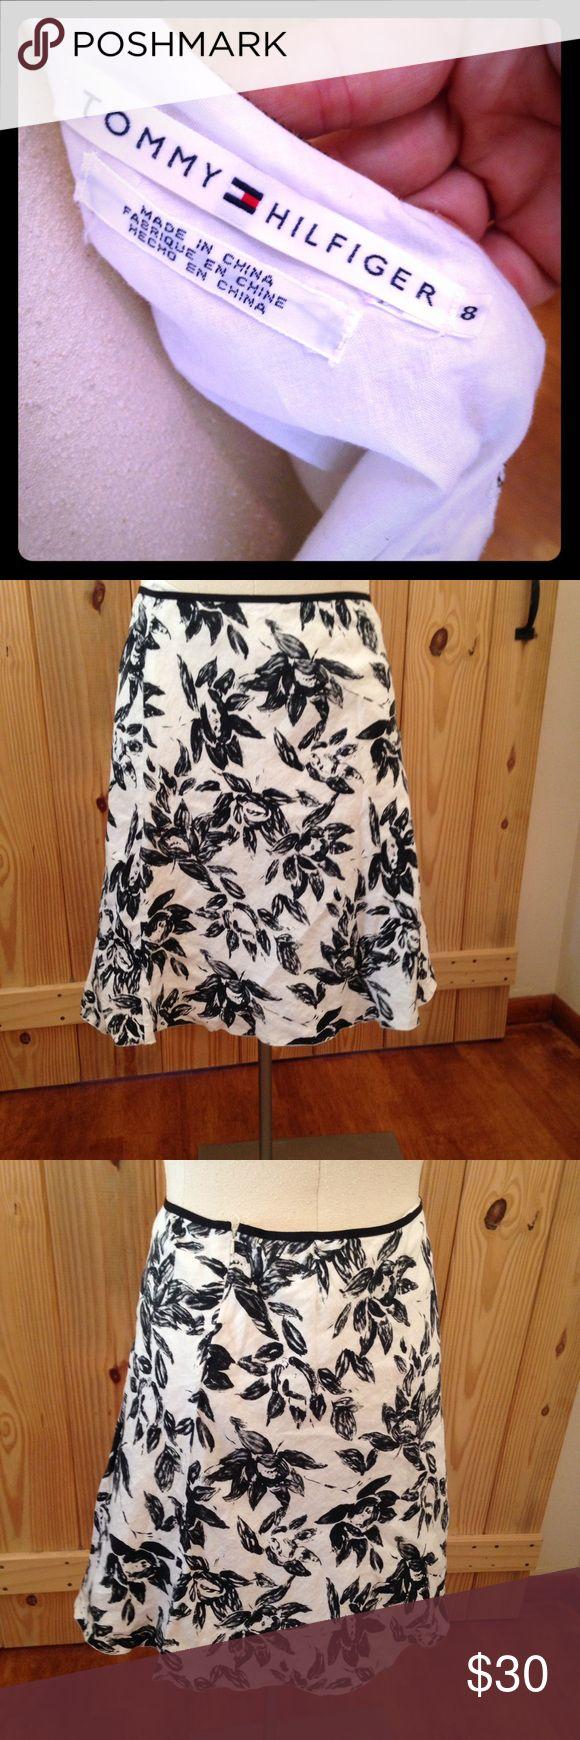 44 Tommy Hilfiger linen black and white skirt sexy Super adorable midi length tea skirt black and white classy pattern size 8 Tommy Hilfiger Tommy Hilfiger Skirts Midi